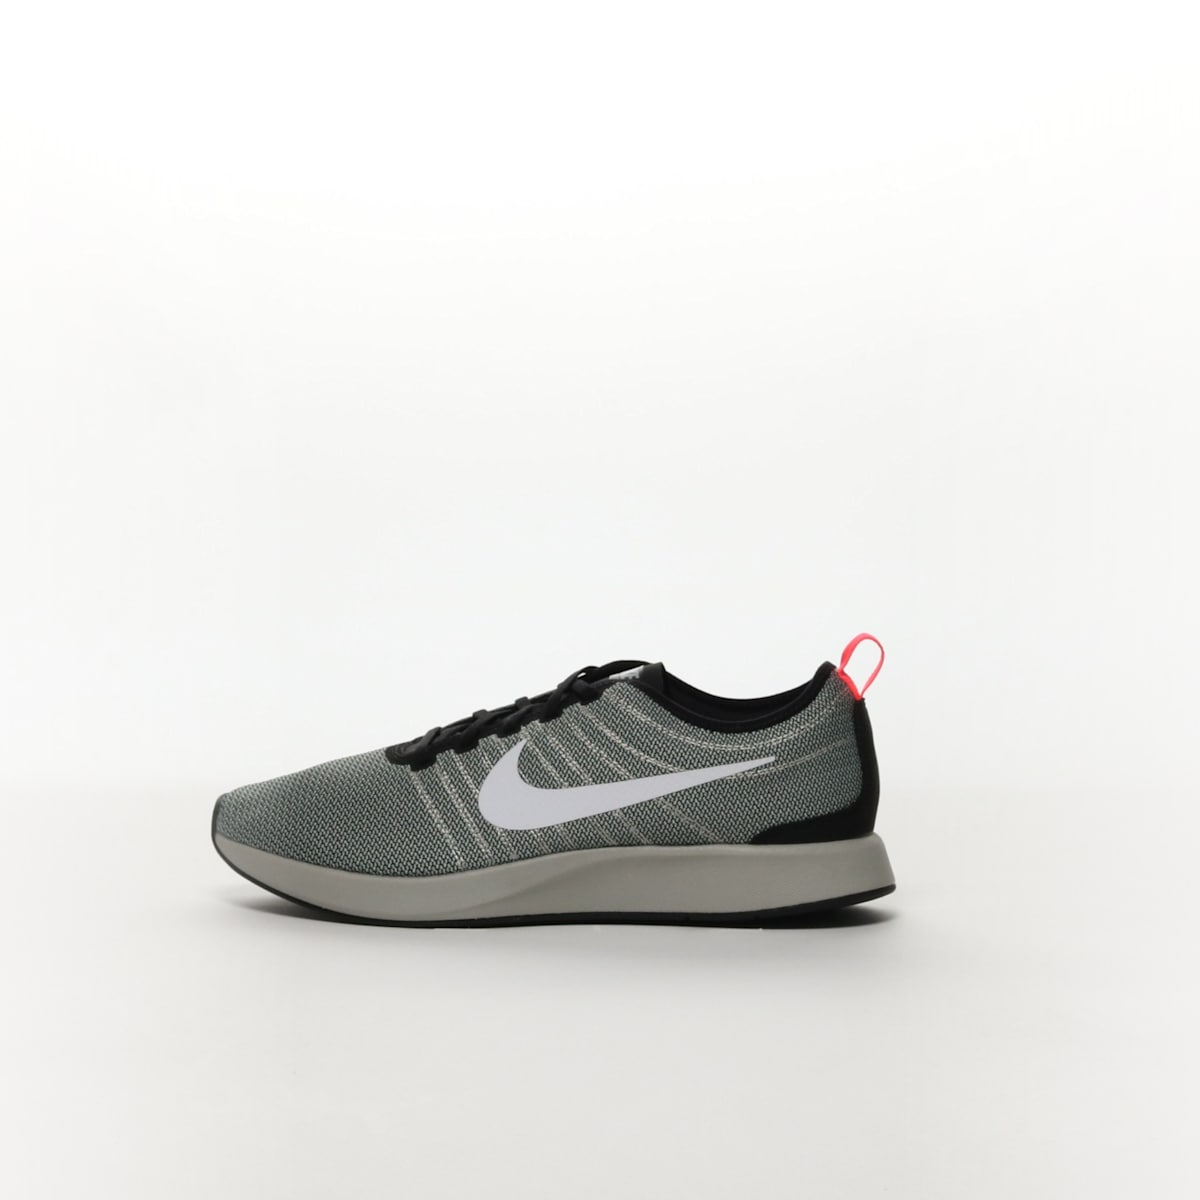 Men's Nike Dualtone Racer Shoe BLACKWHITE PALE GREY SOLAR RED